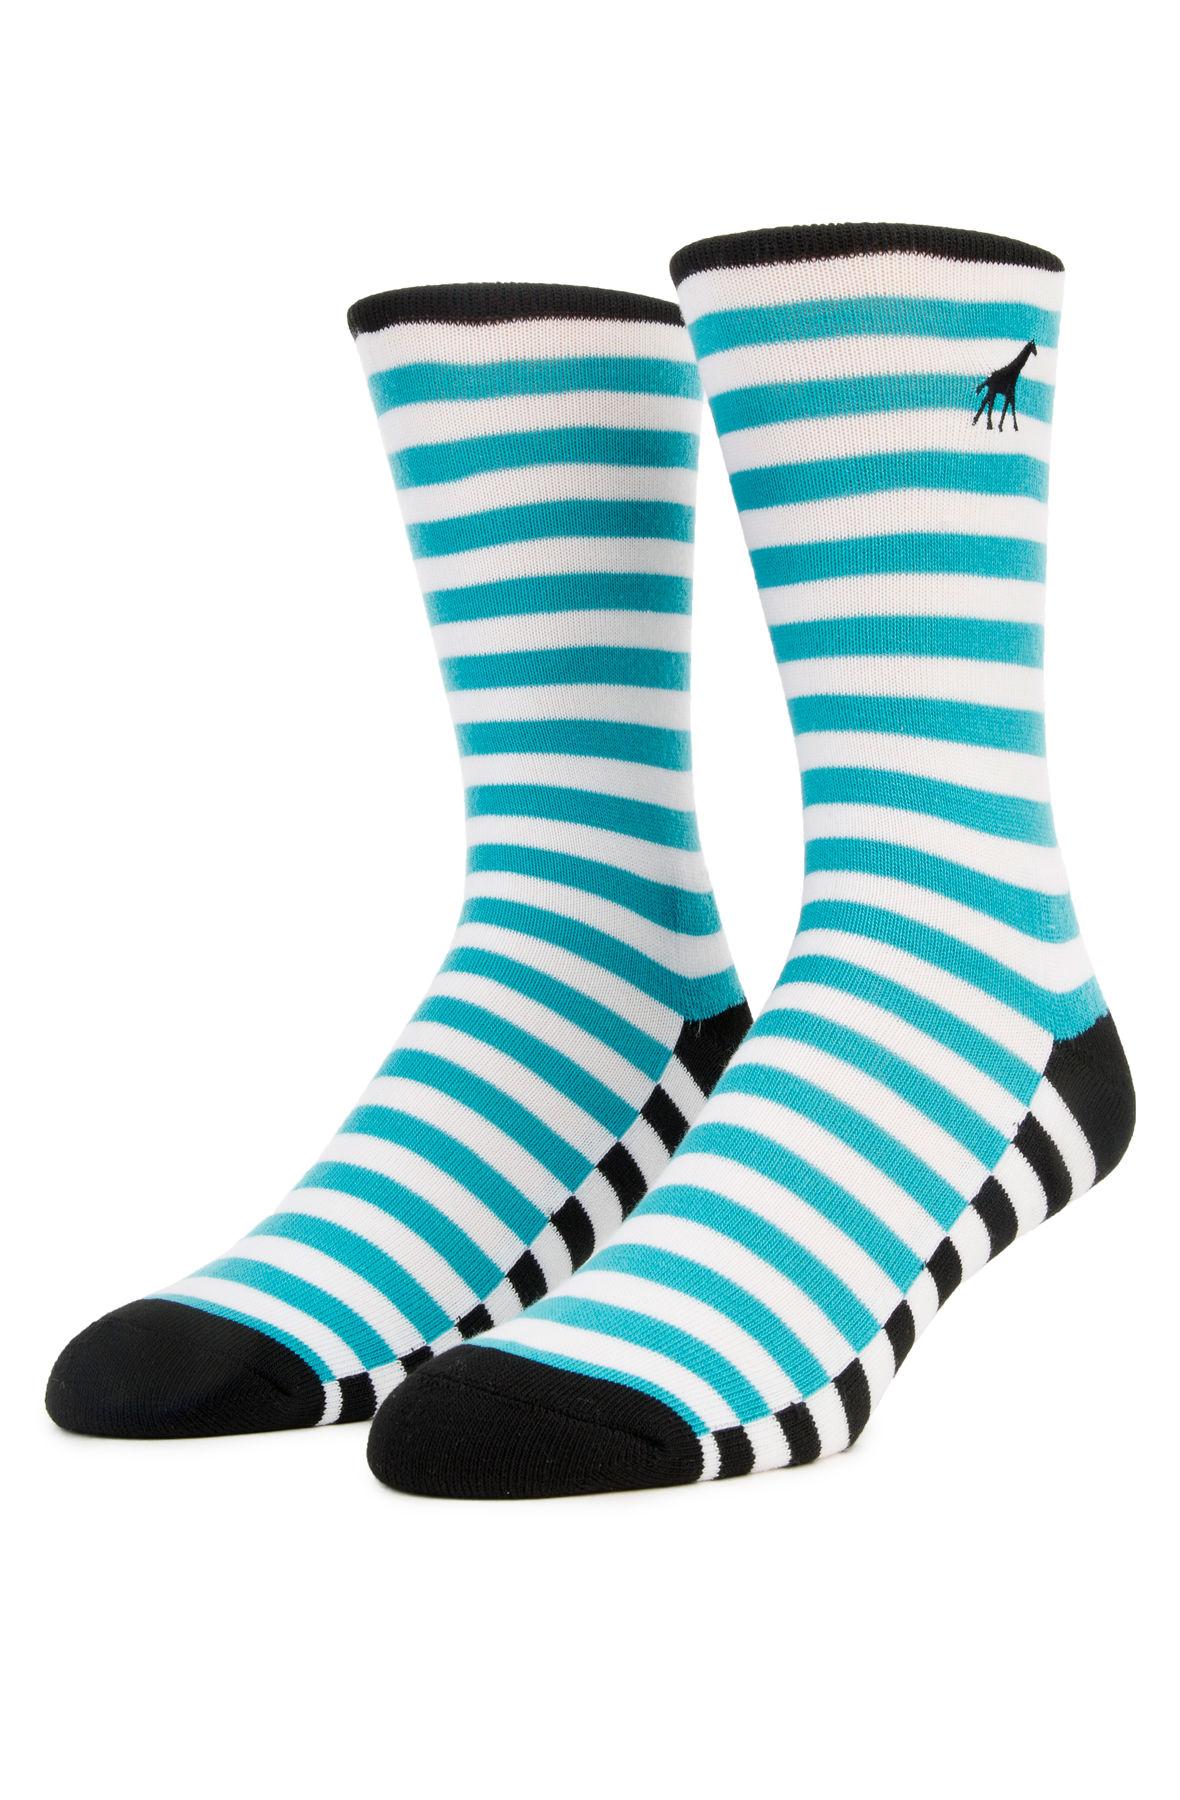 Image of The LRGeneration Teal Stripe Socks